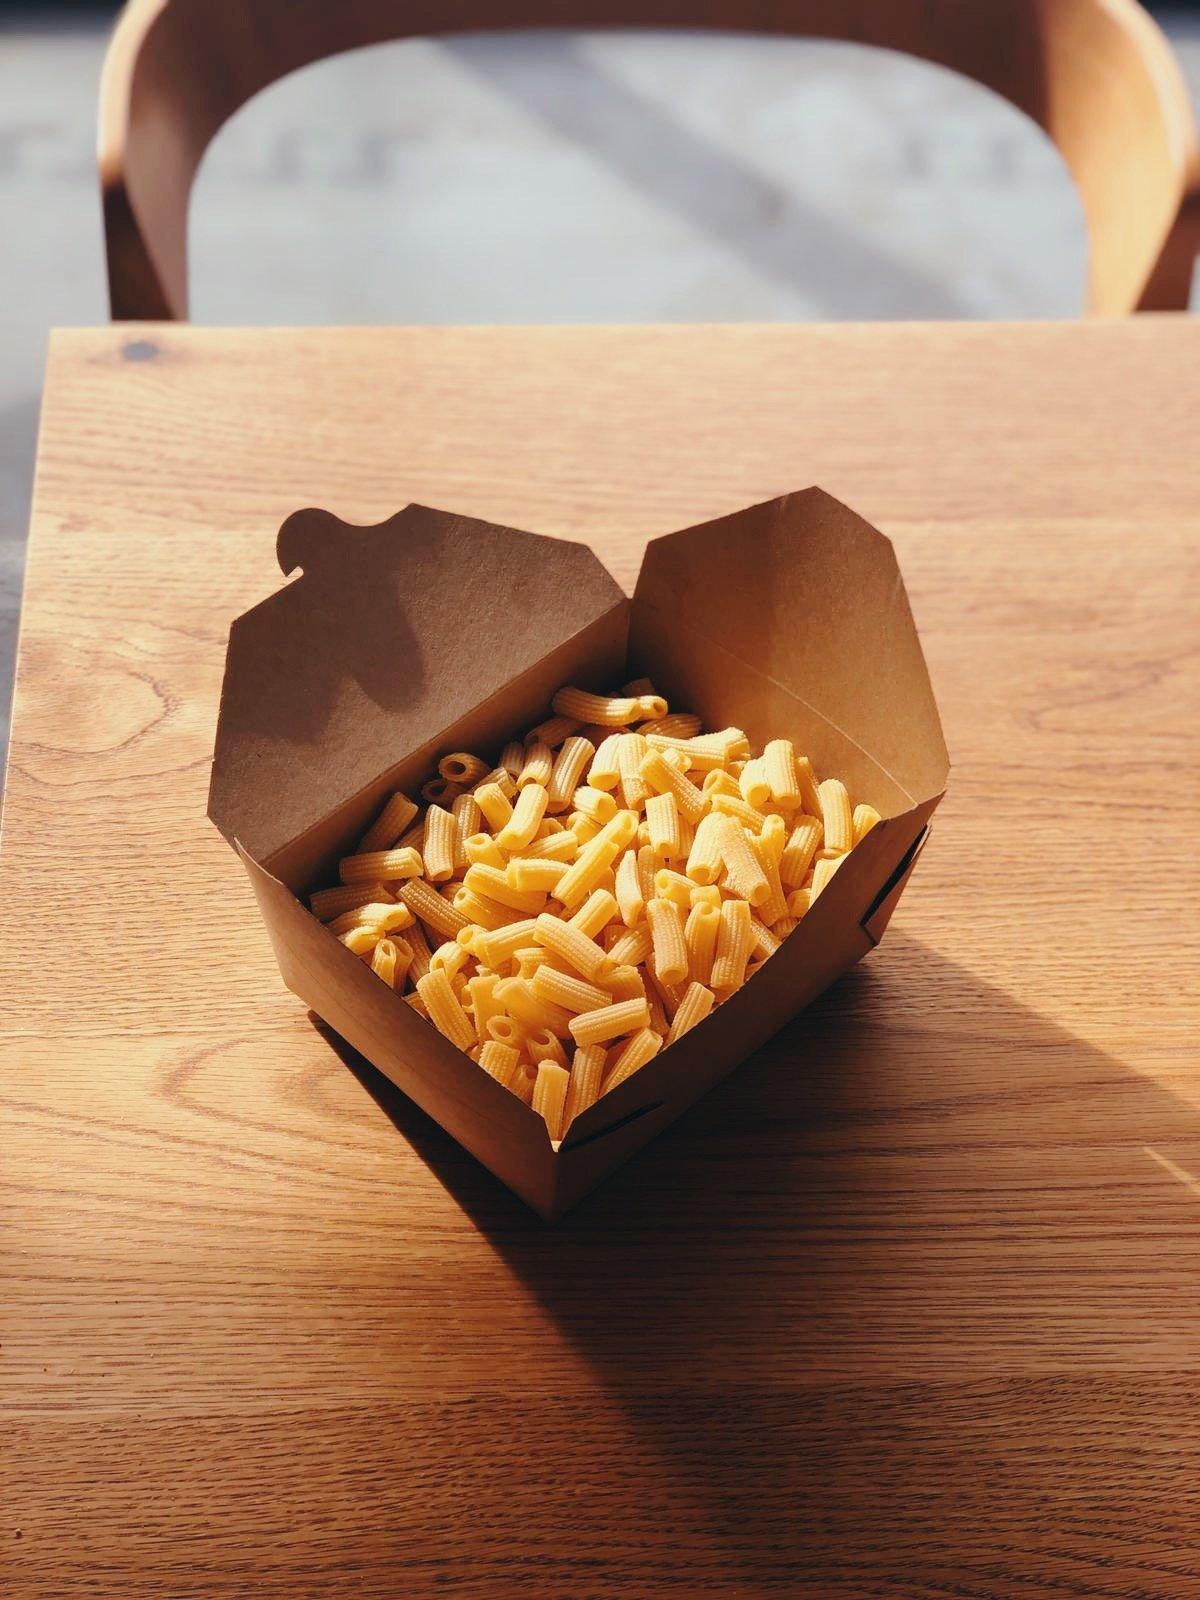 Image of Box of Pasta